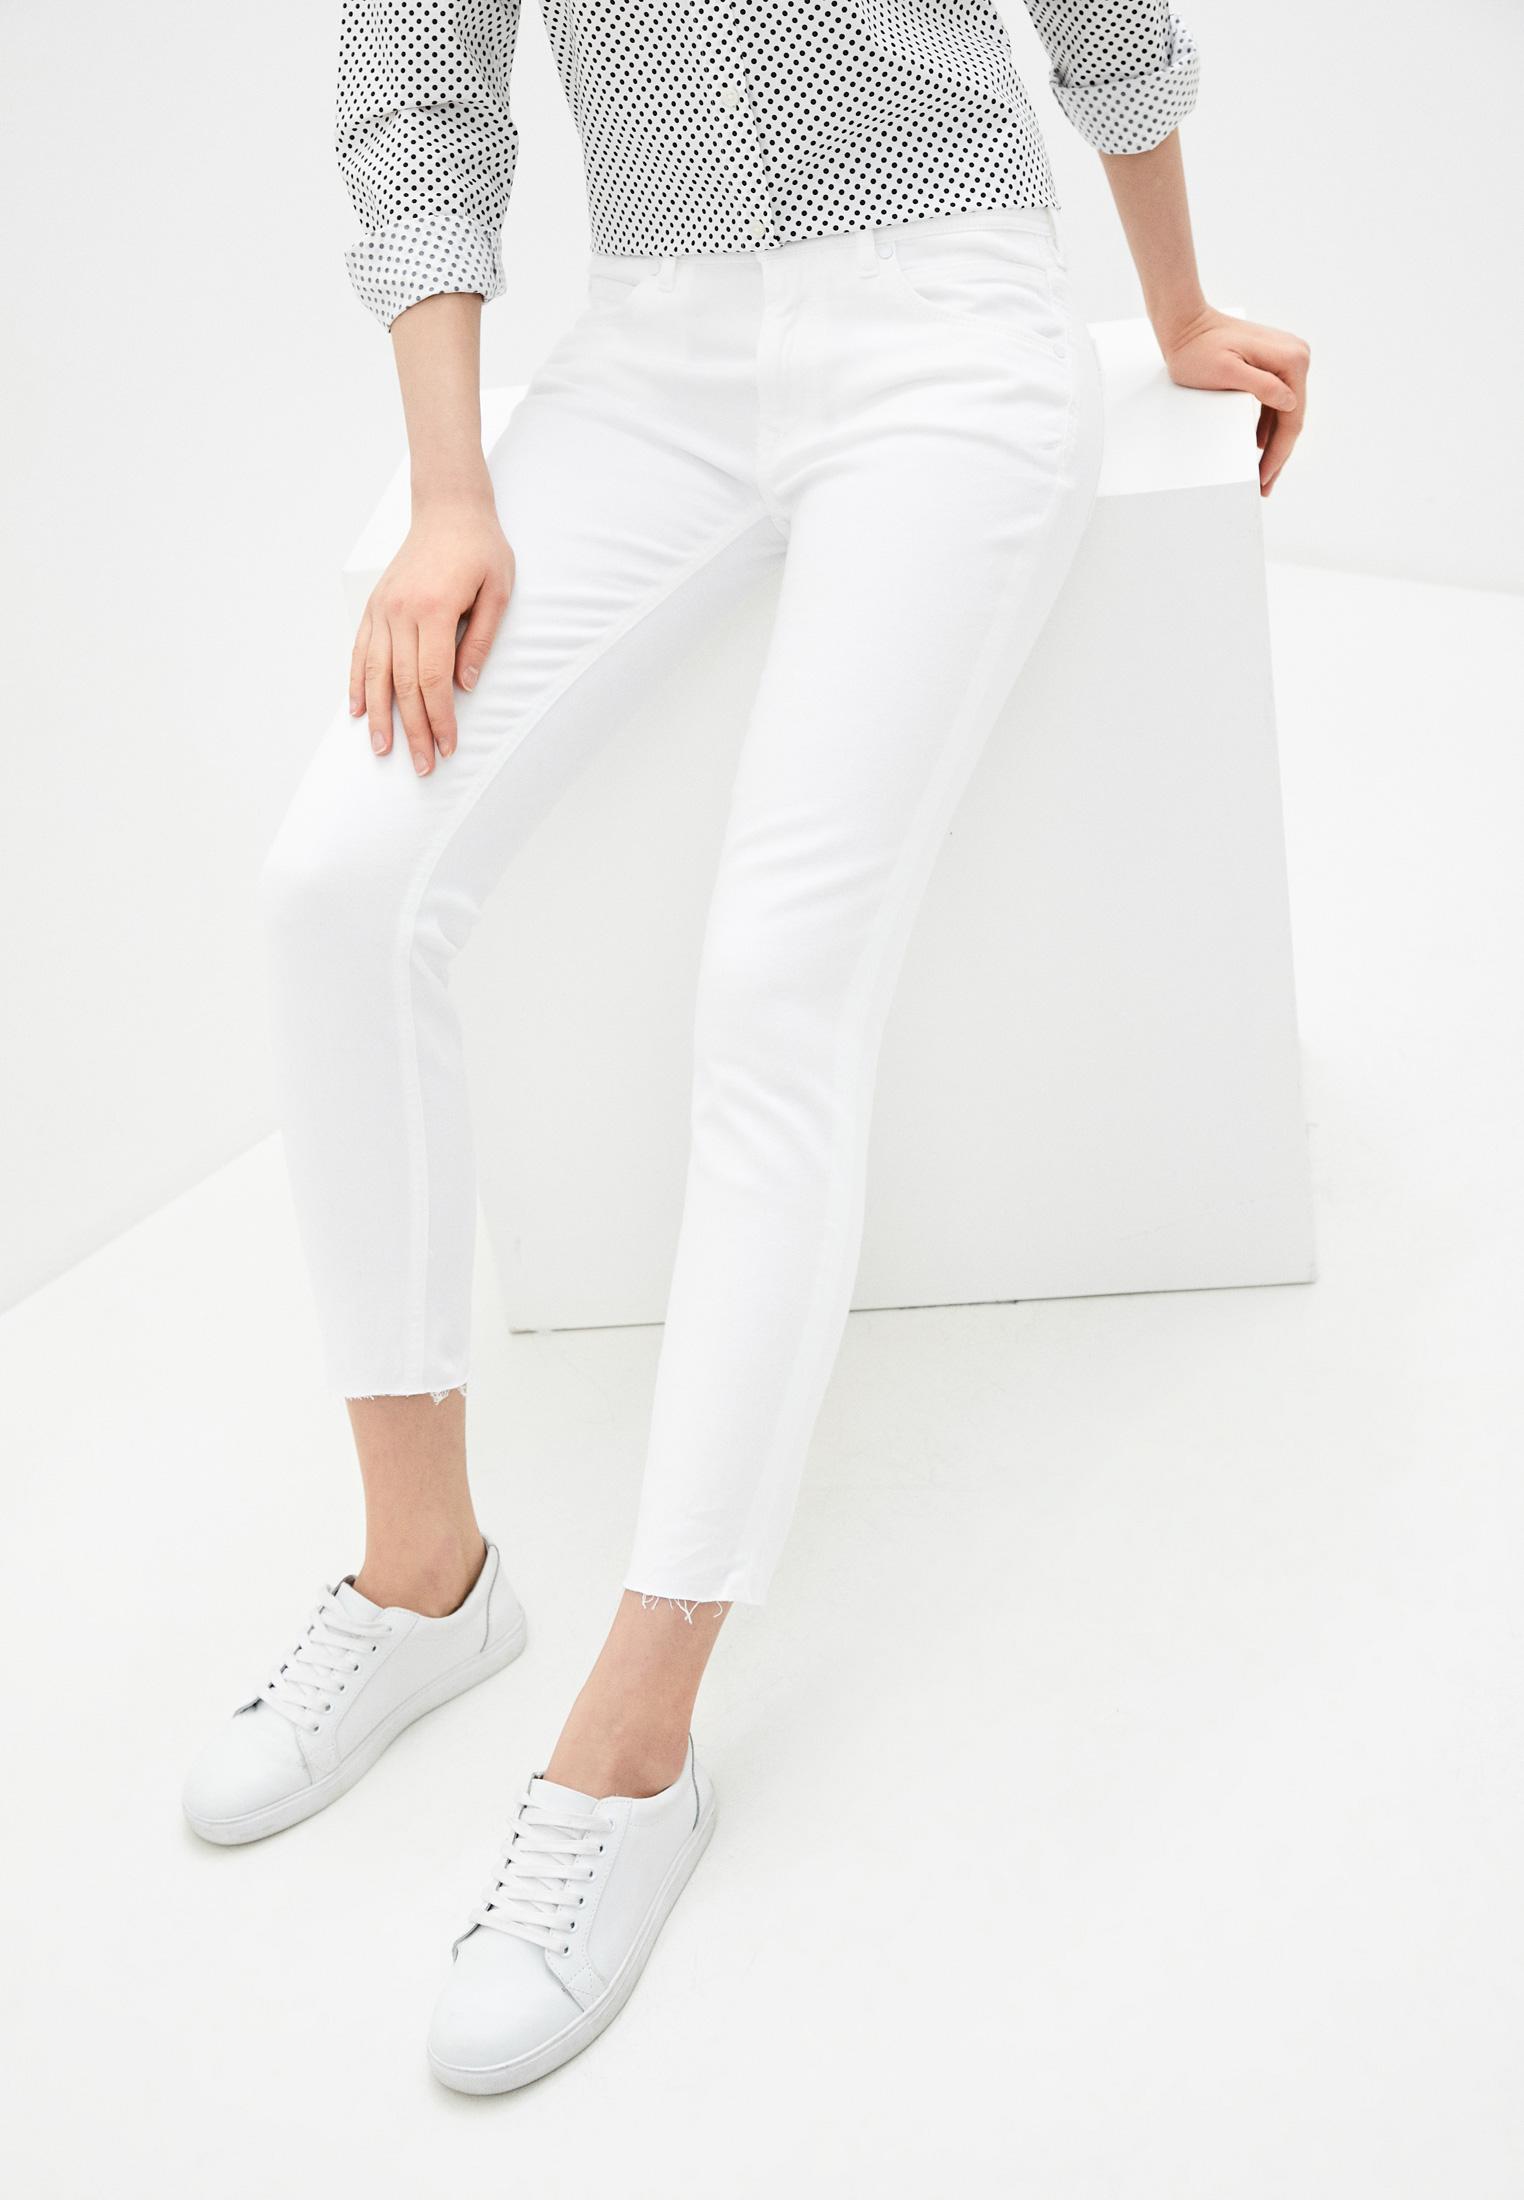 Зауженные джинсы Marc O'Polo DENIM 043 9416 12221